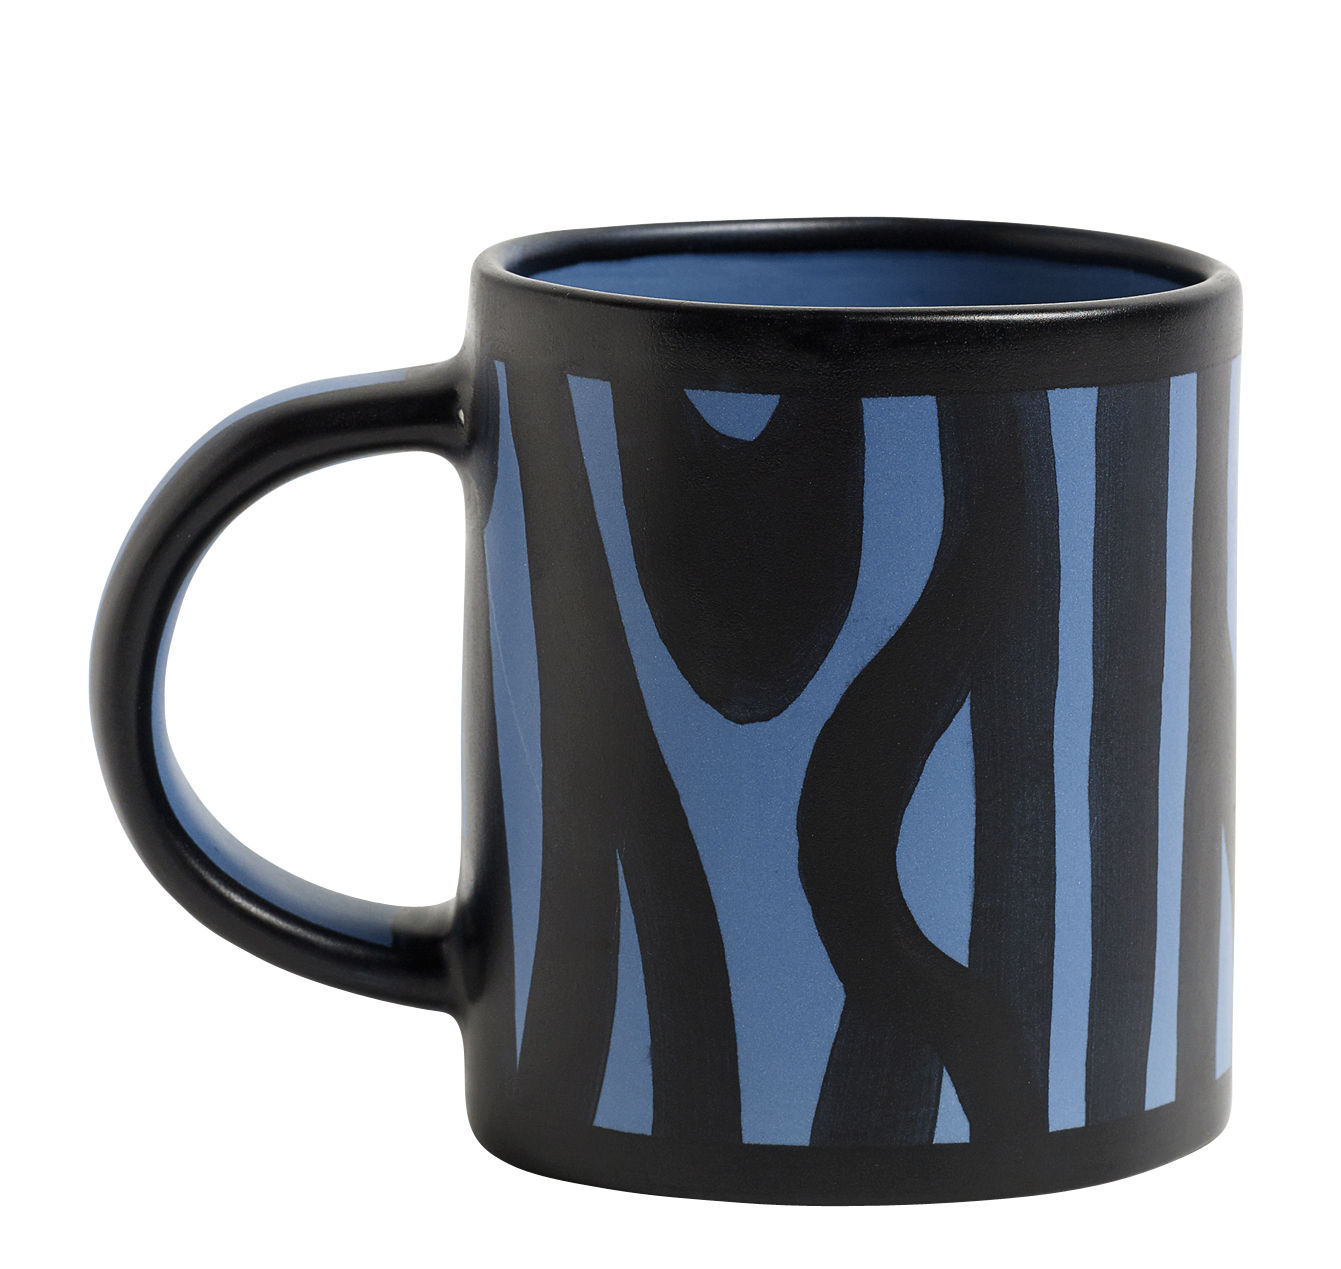 Arts de la table - Tasses et mugs - Mug Wood / Peint à la main - Hay - Bleu royal - Grès émaillé